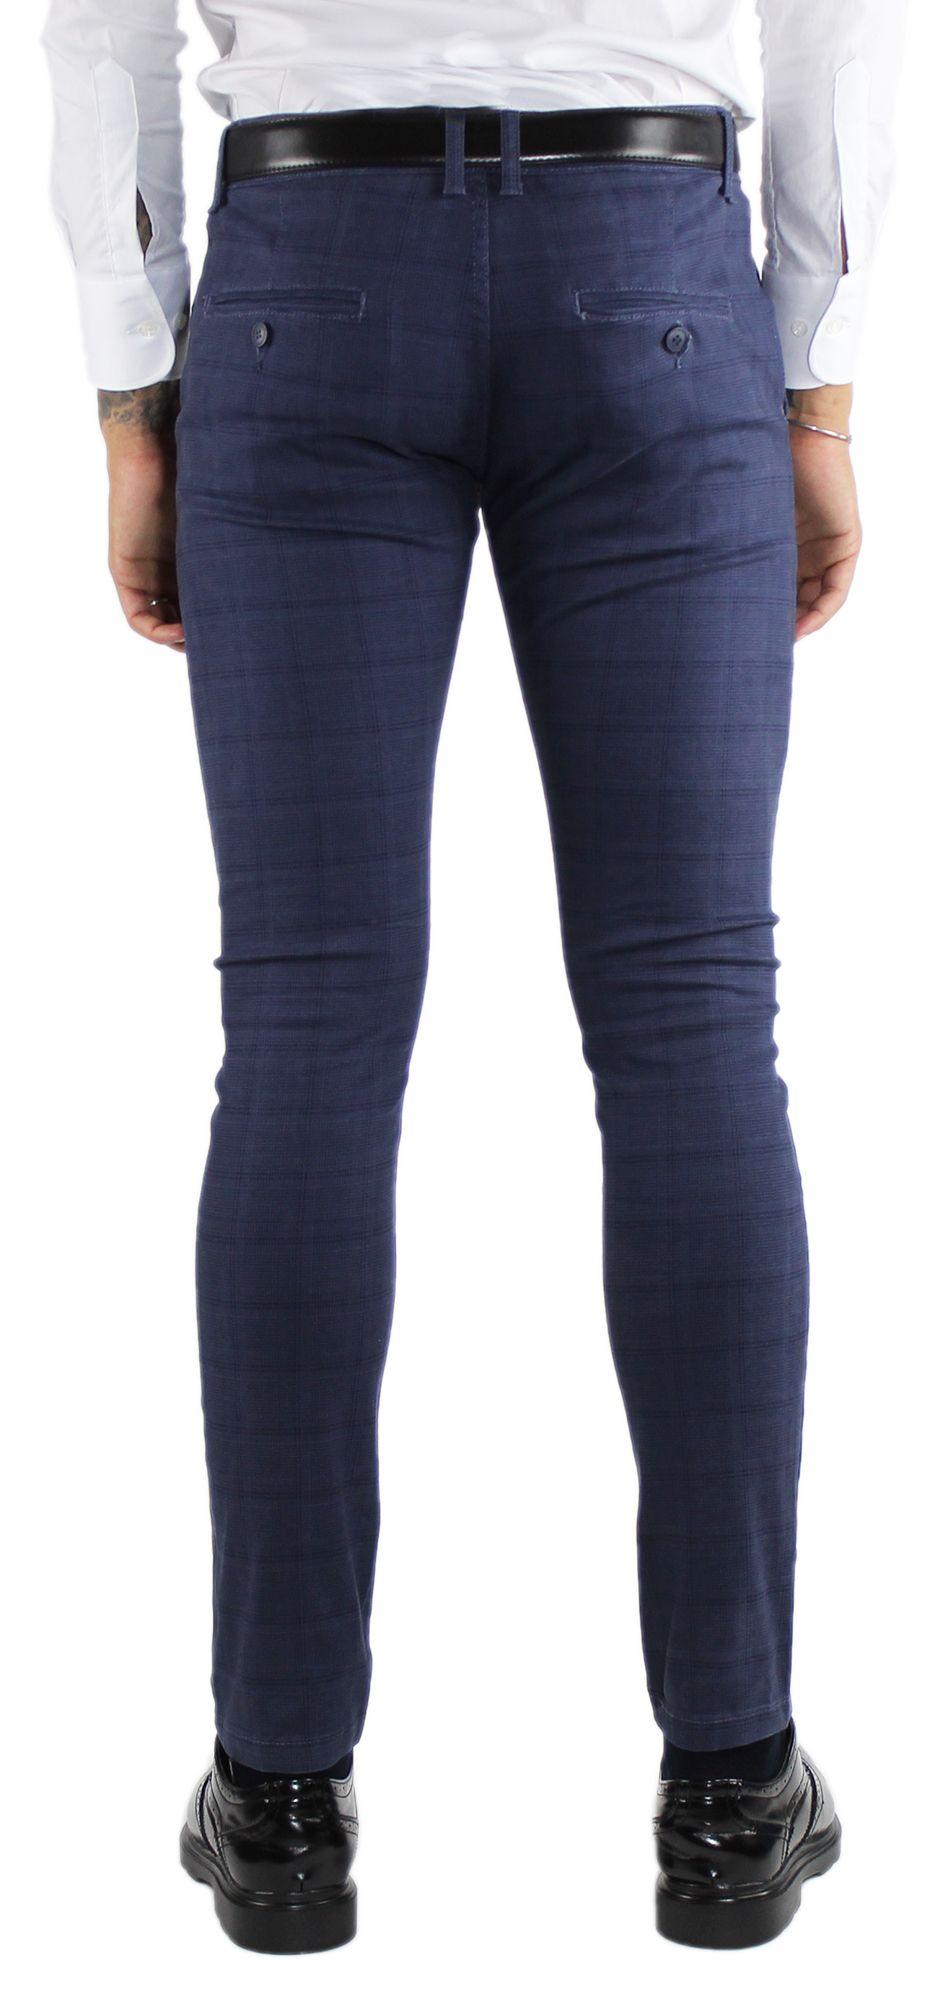 Pantaloni-Uomo-Invernali-a-Quadri-Eleganti-Pantalone-Slim-Fit-Elasticizzati-Scoz miniatura 14